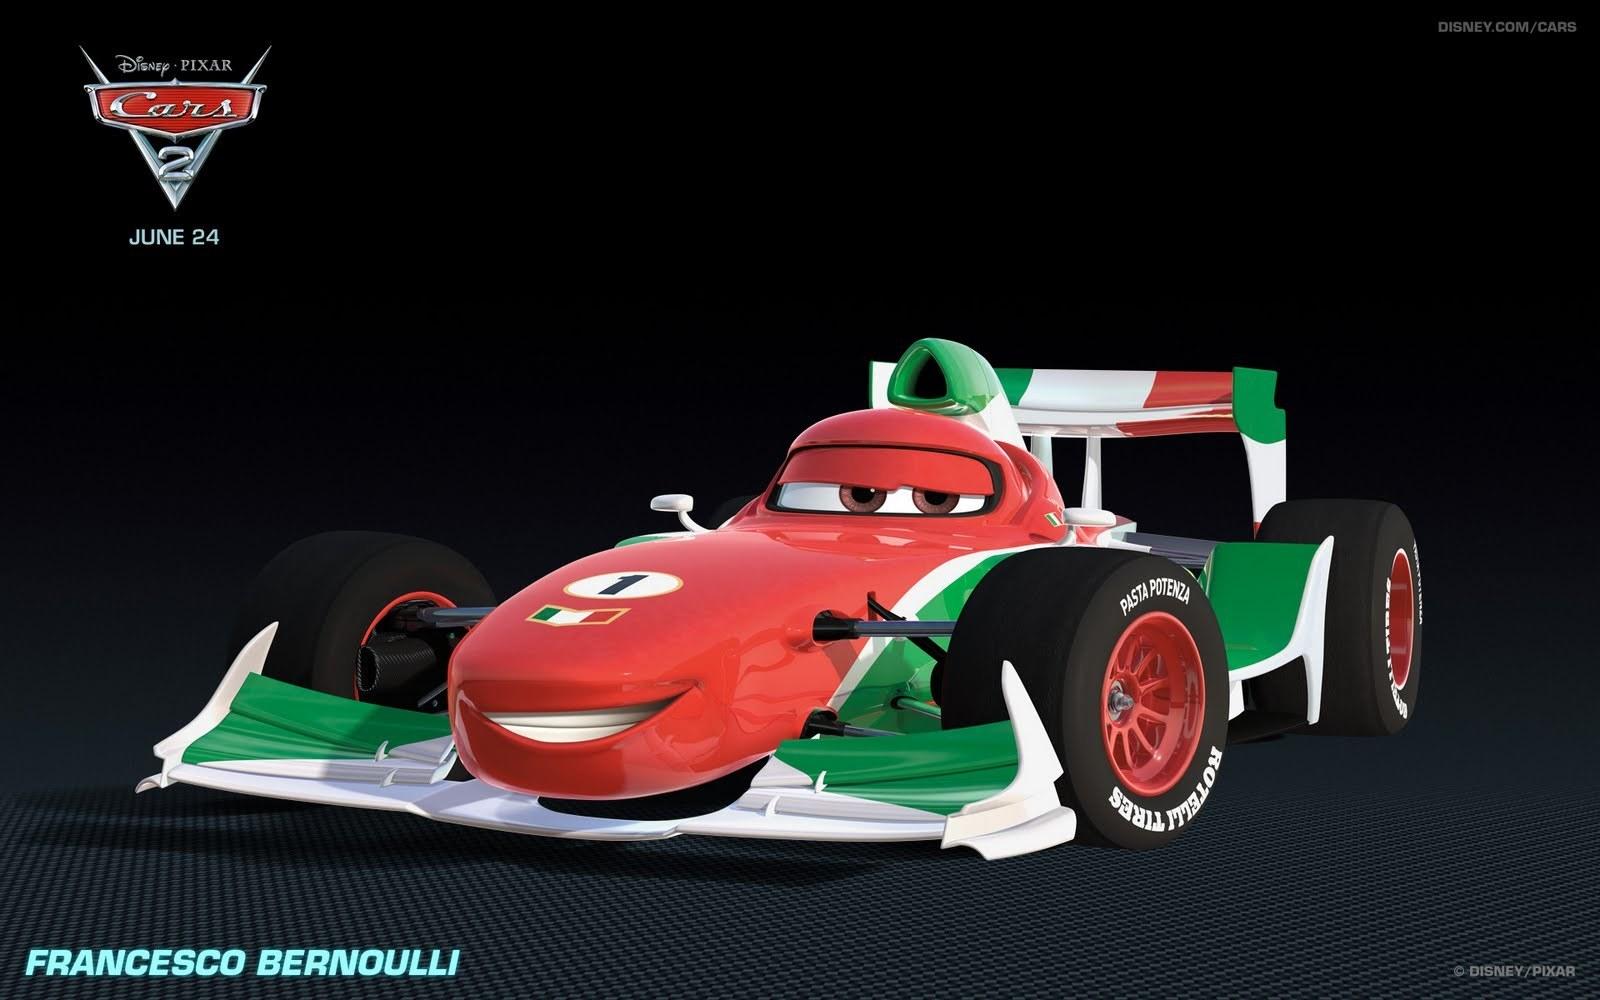 cars wallpaper cars 2 pixar. Black Bedroom Furniture Sets. Home Design Ideas